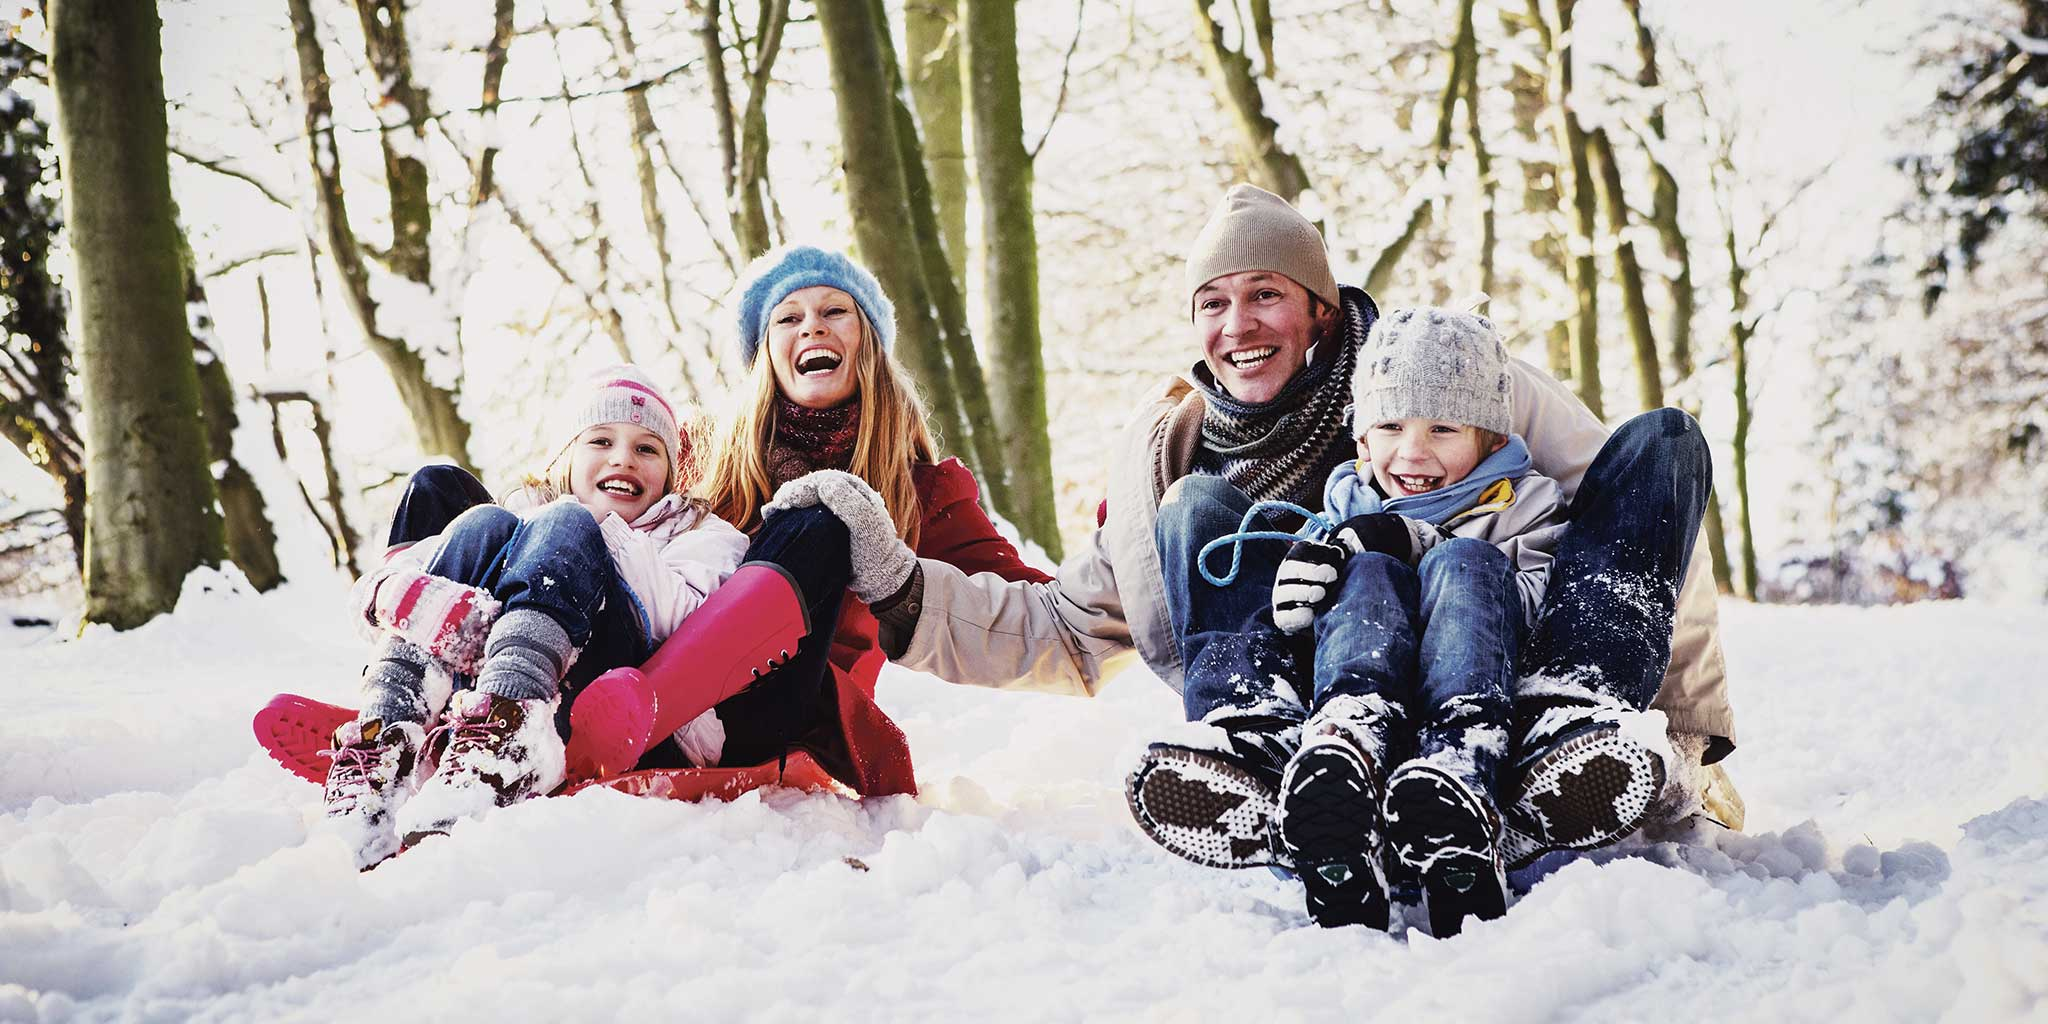 gezin lachend in de sneeuw